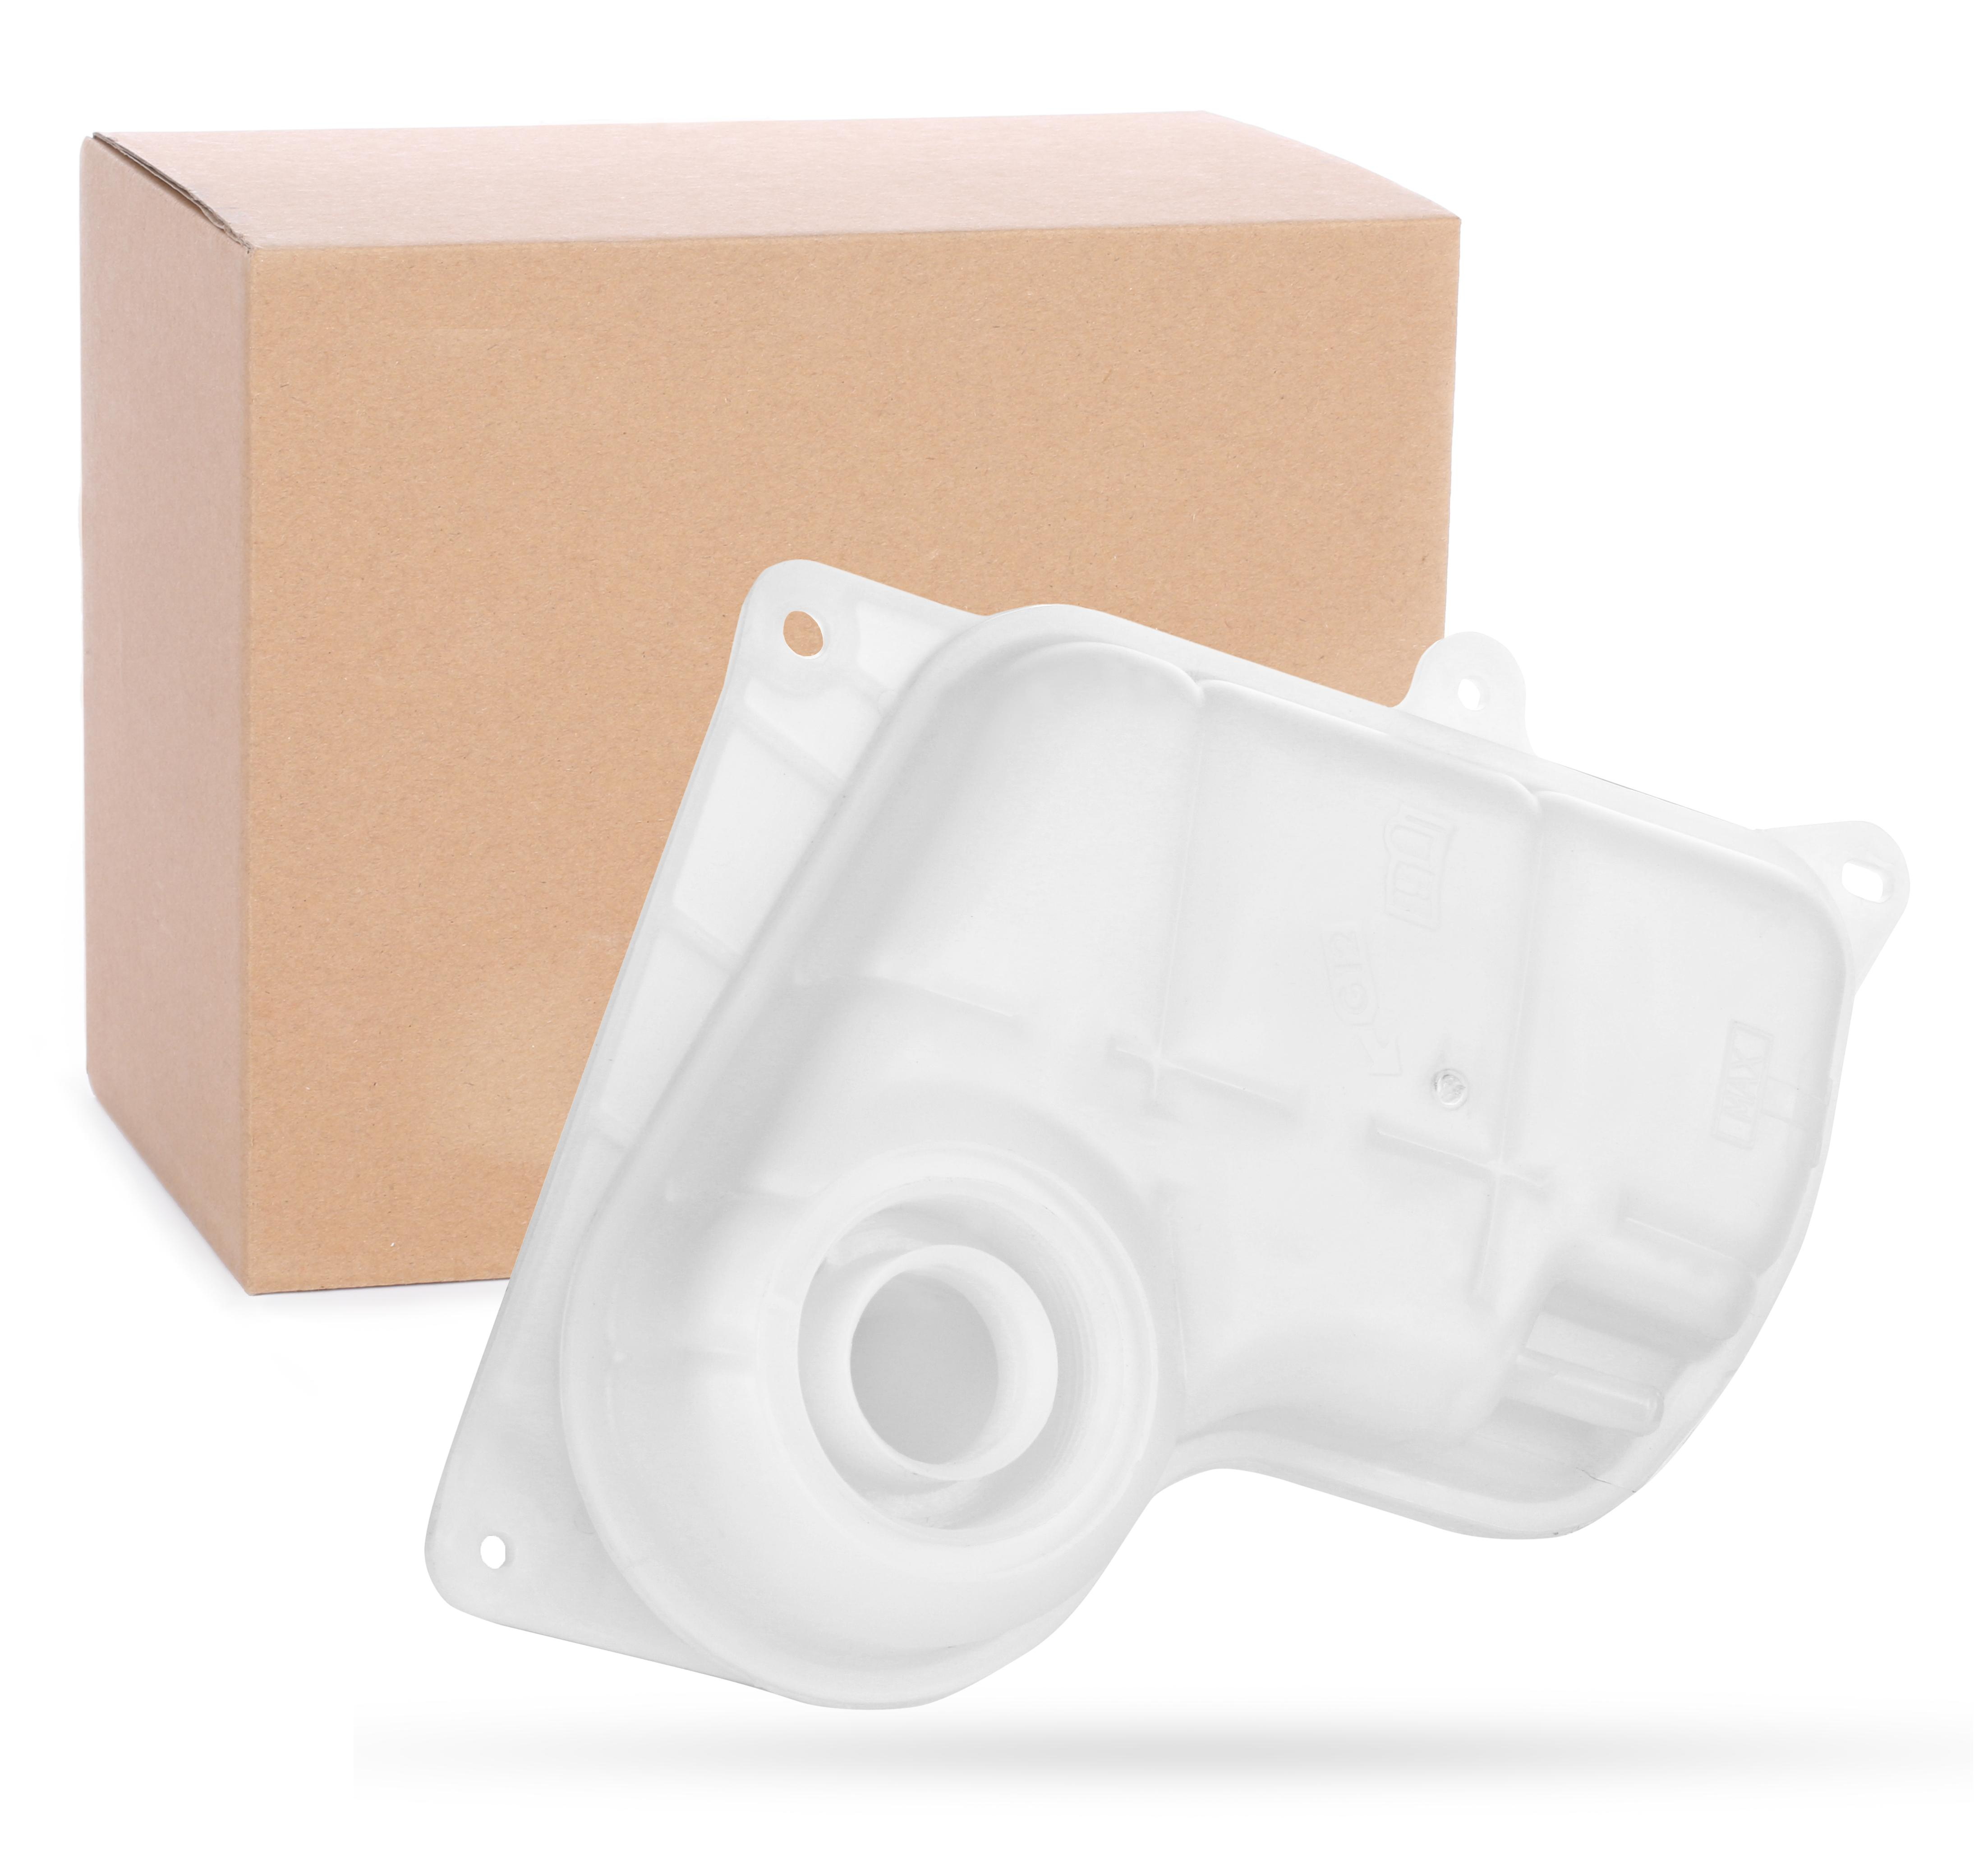 AUDI A4 2014 Kühlflüssigkeitsbehälter - Original ABAKUS 053-026-001